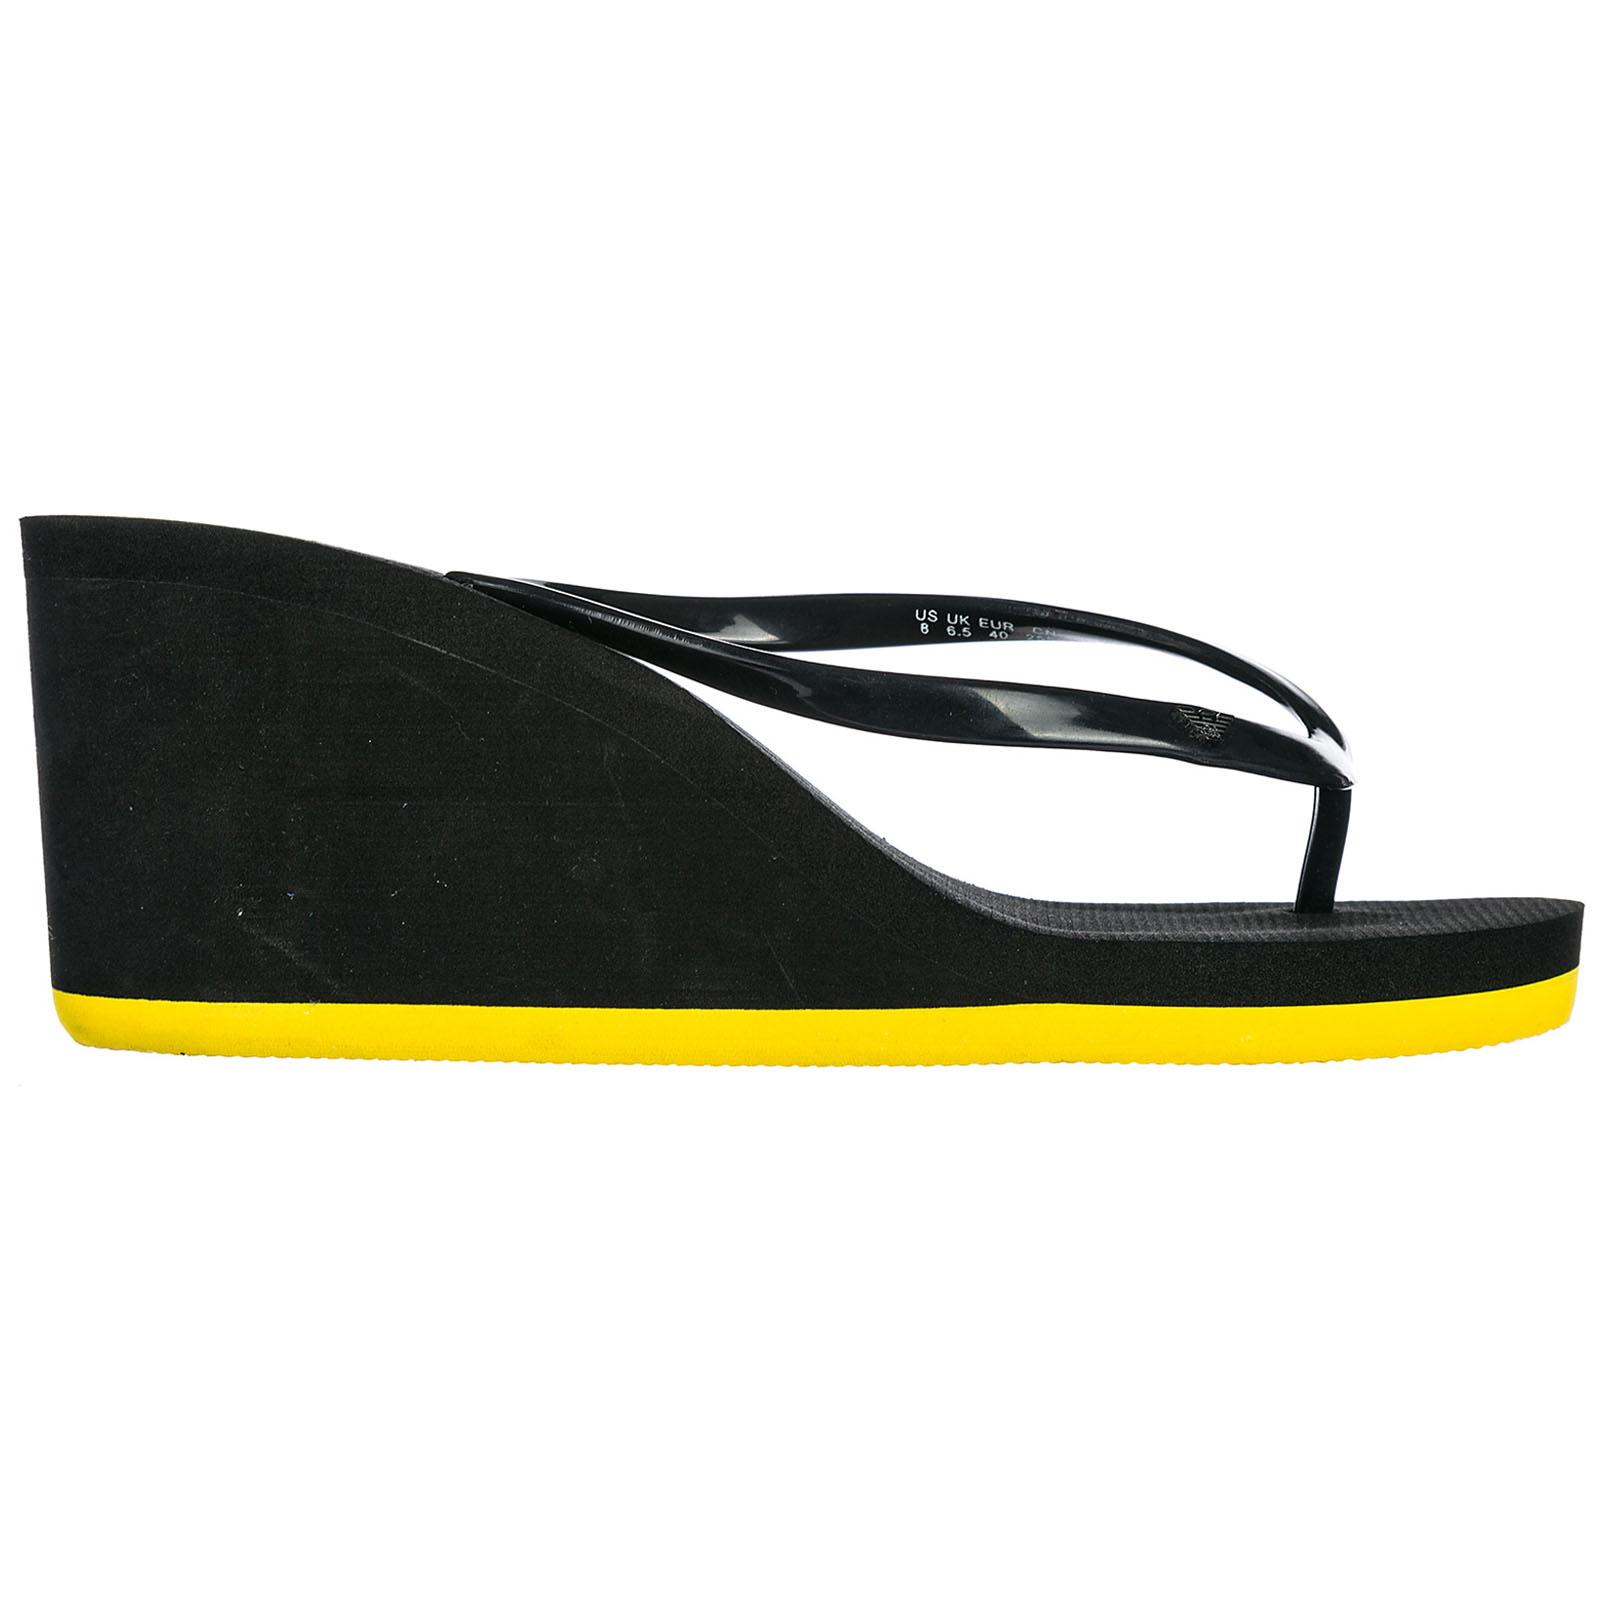 980ca04d1 Emporio Armani EA7 Women s flip flops sandals core active